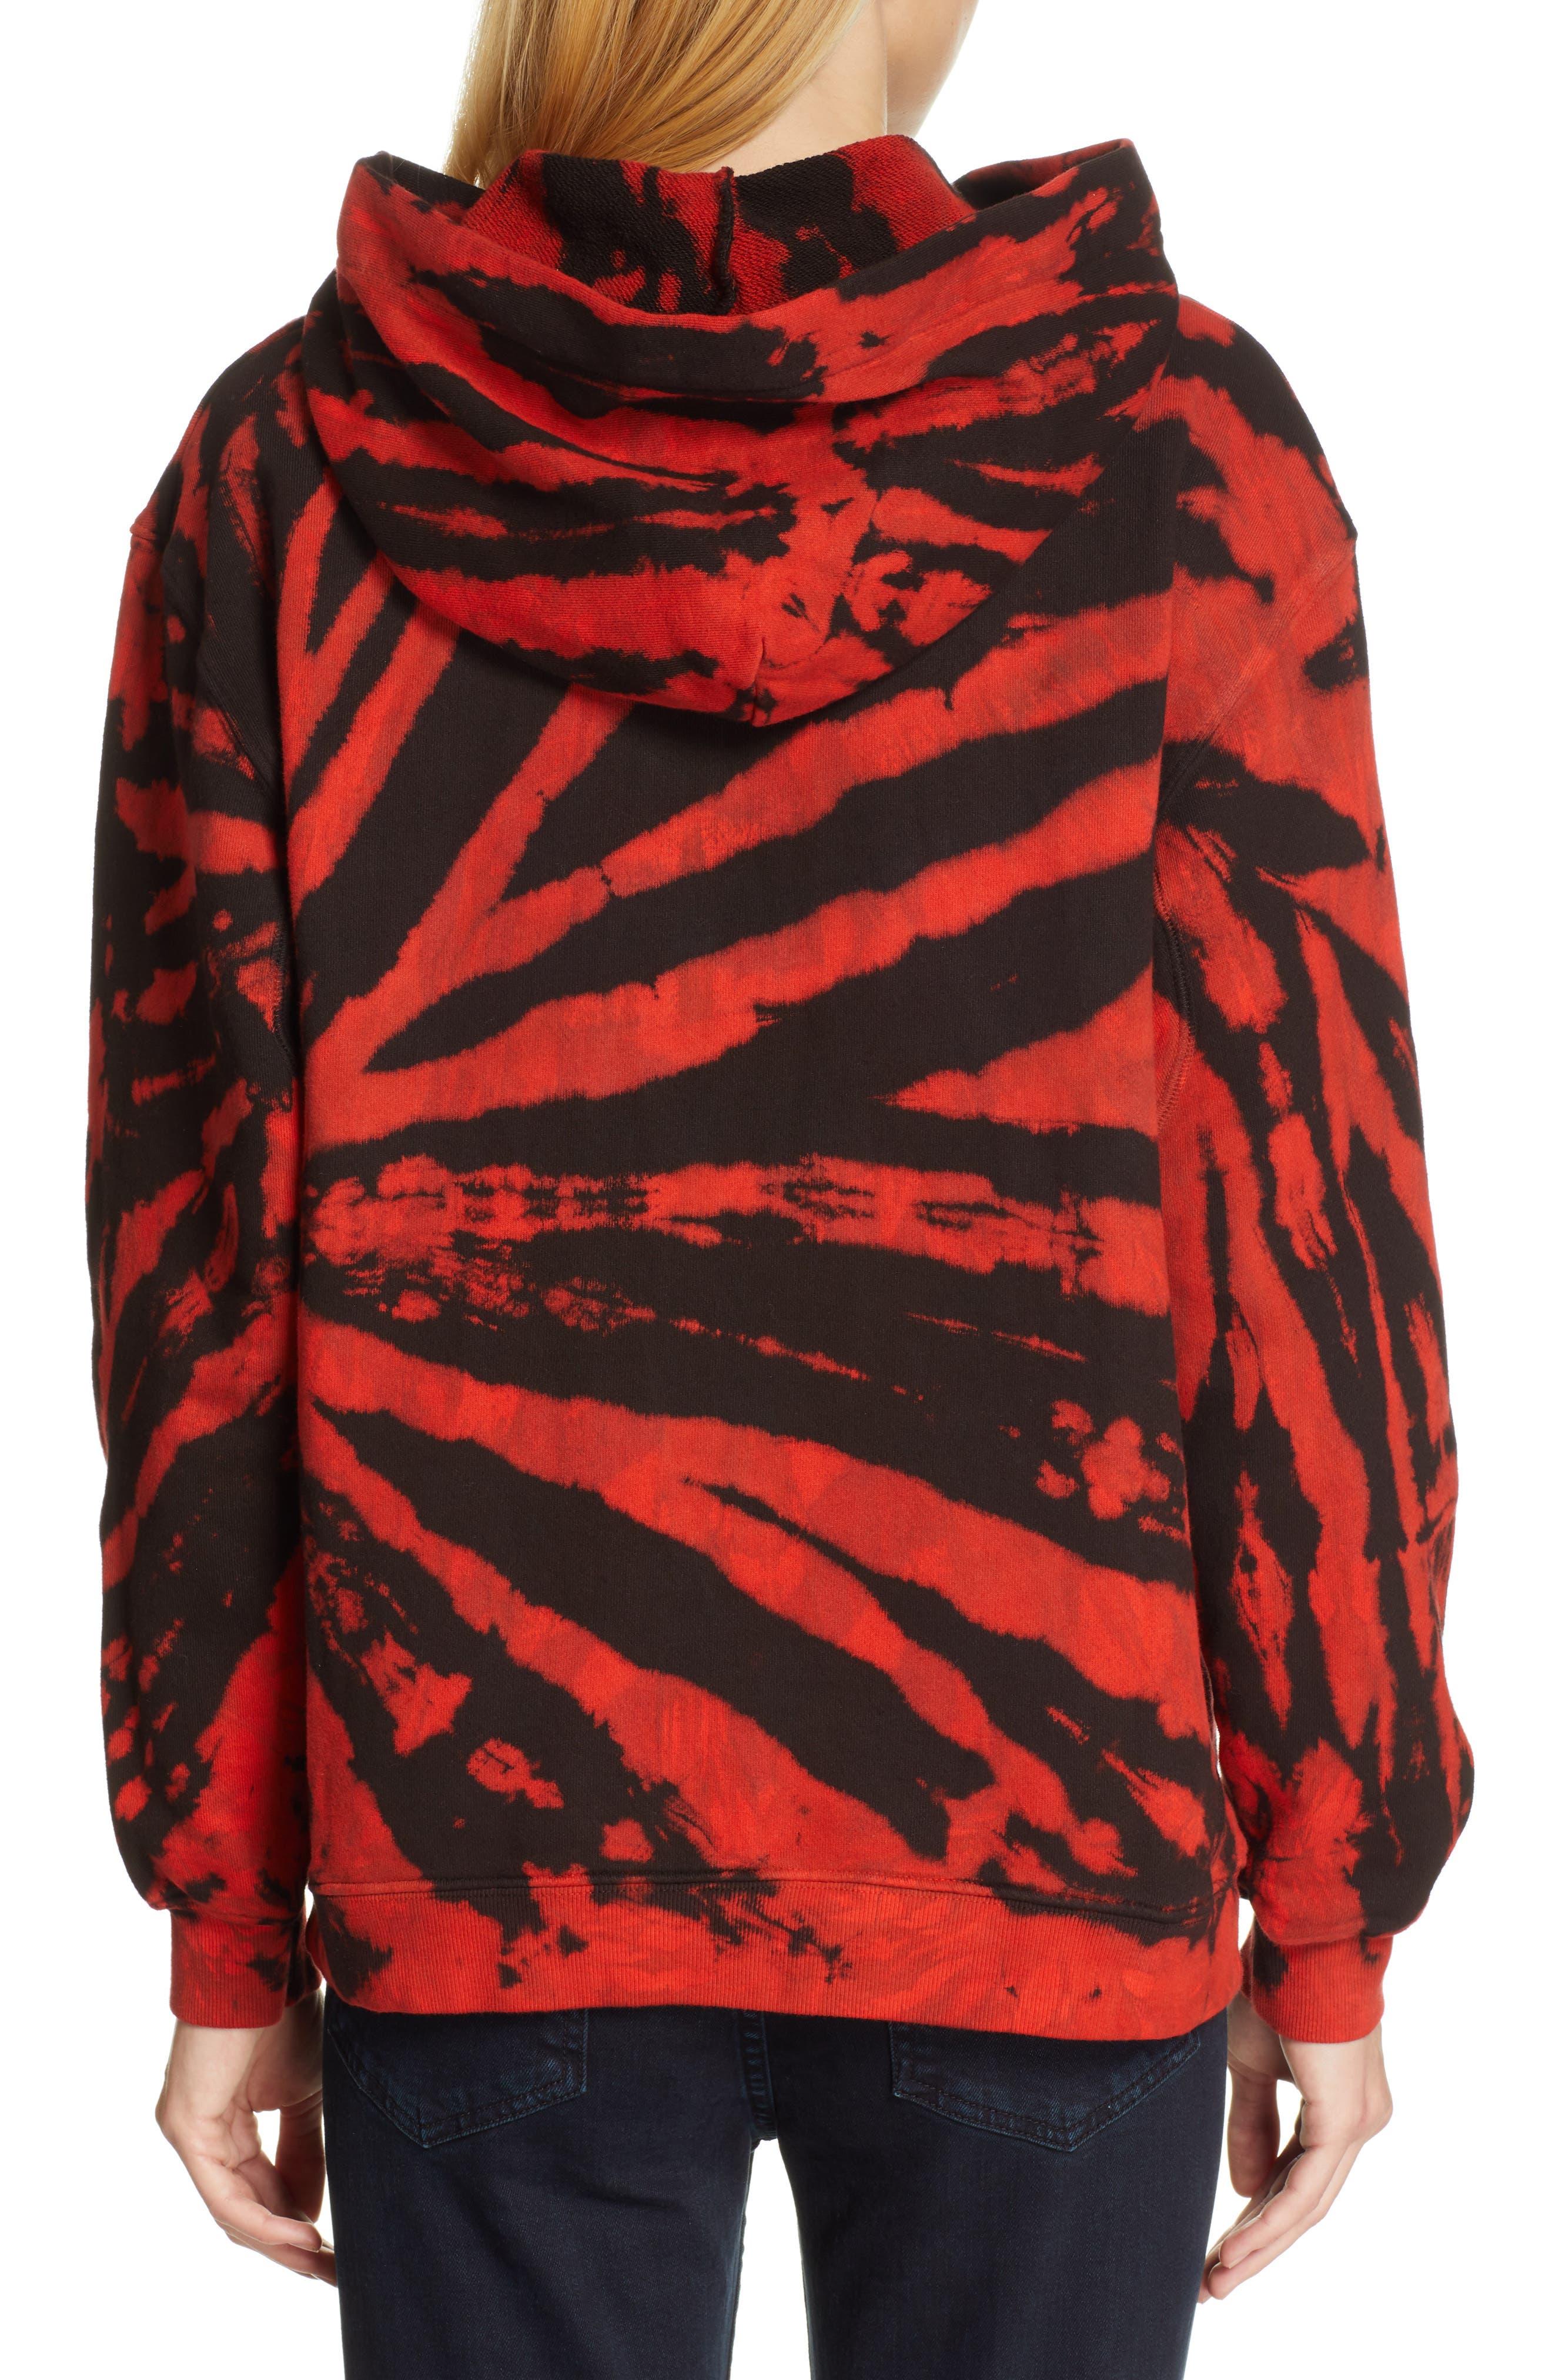 PROENZA SCHOULER, PSWL Tie Dye Hoodie, Alternate thumbnail 2, color, RED/ BLACK